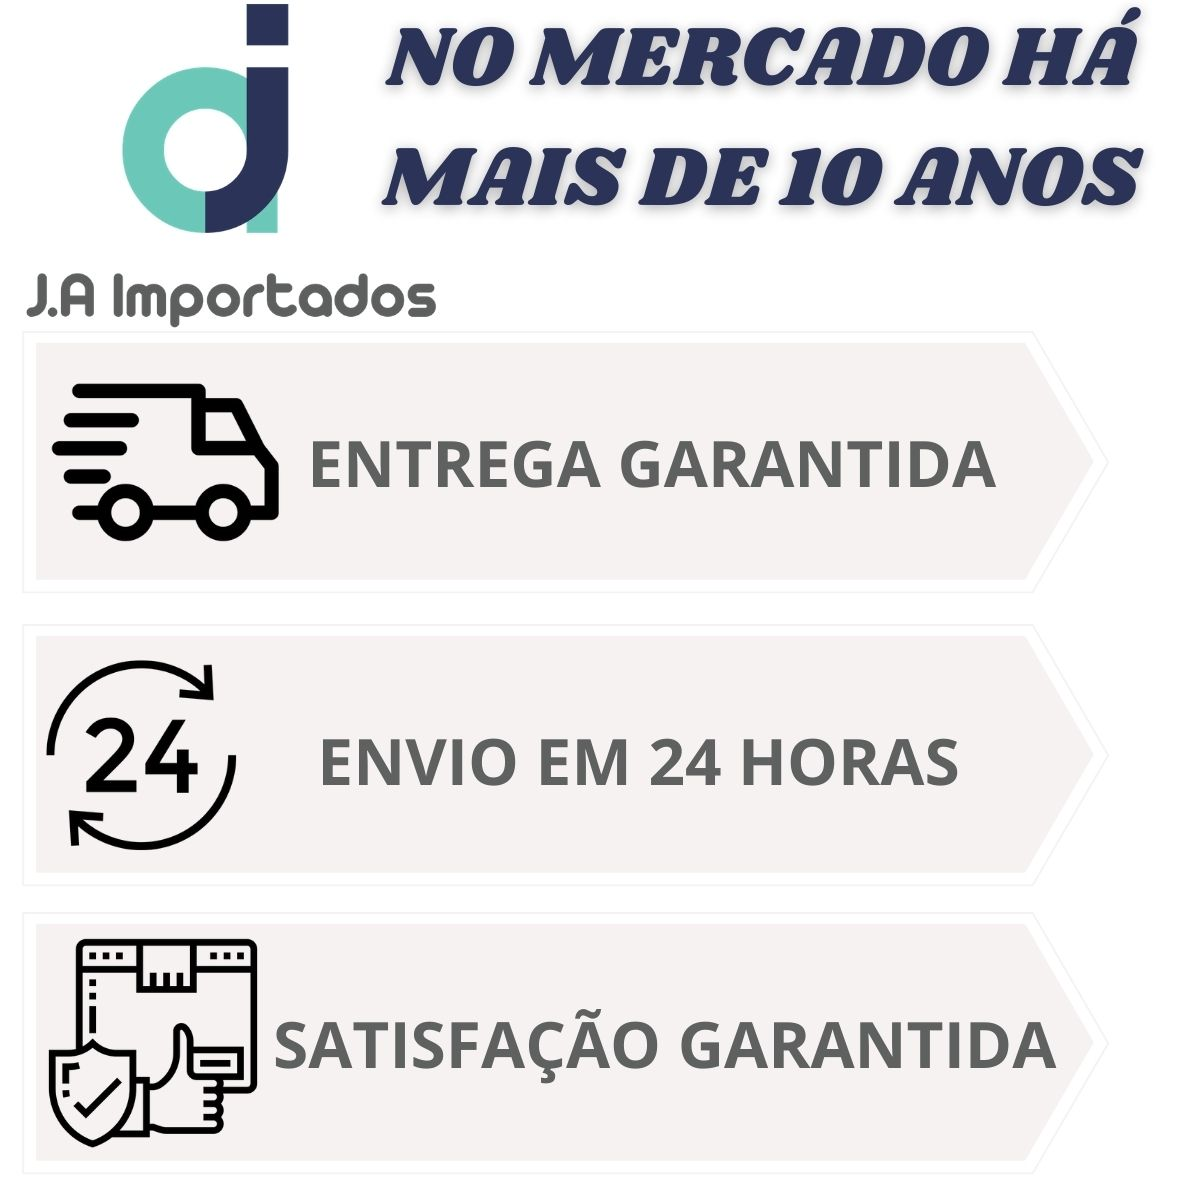 BOIA DE BRACO INFLAVEL PRINCESAS